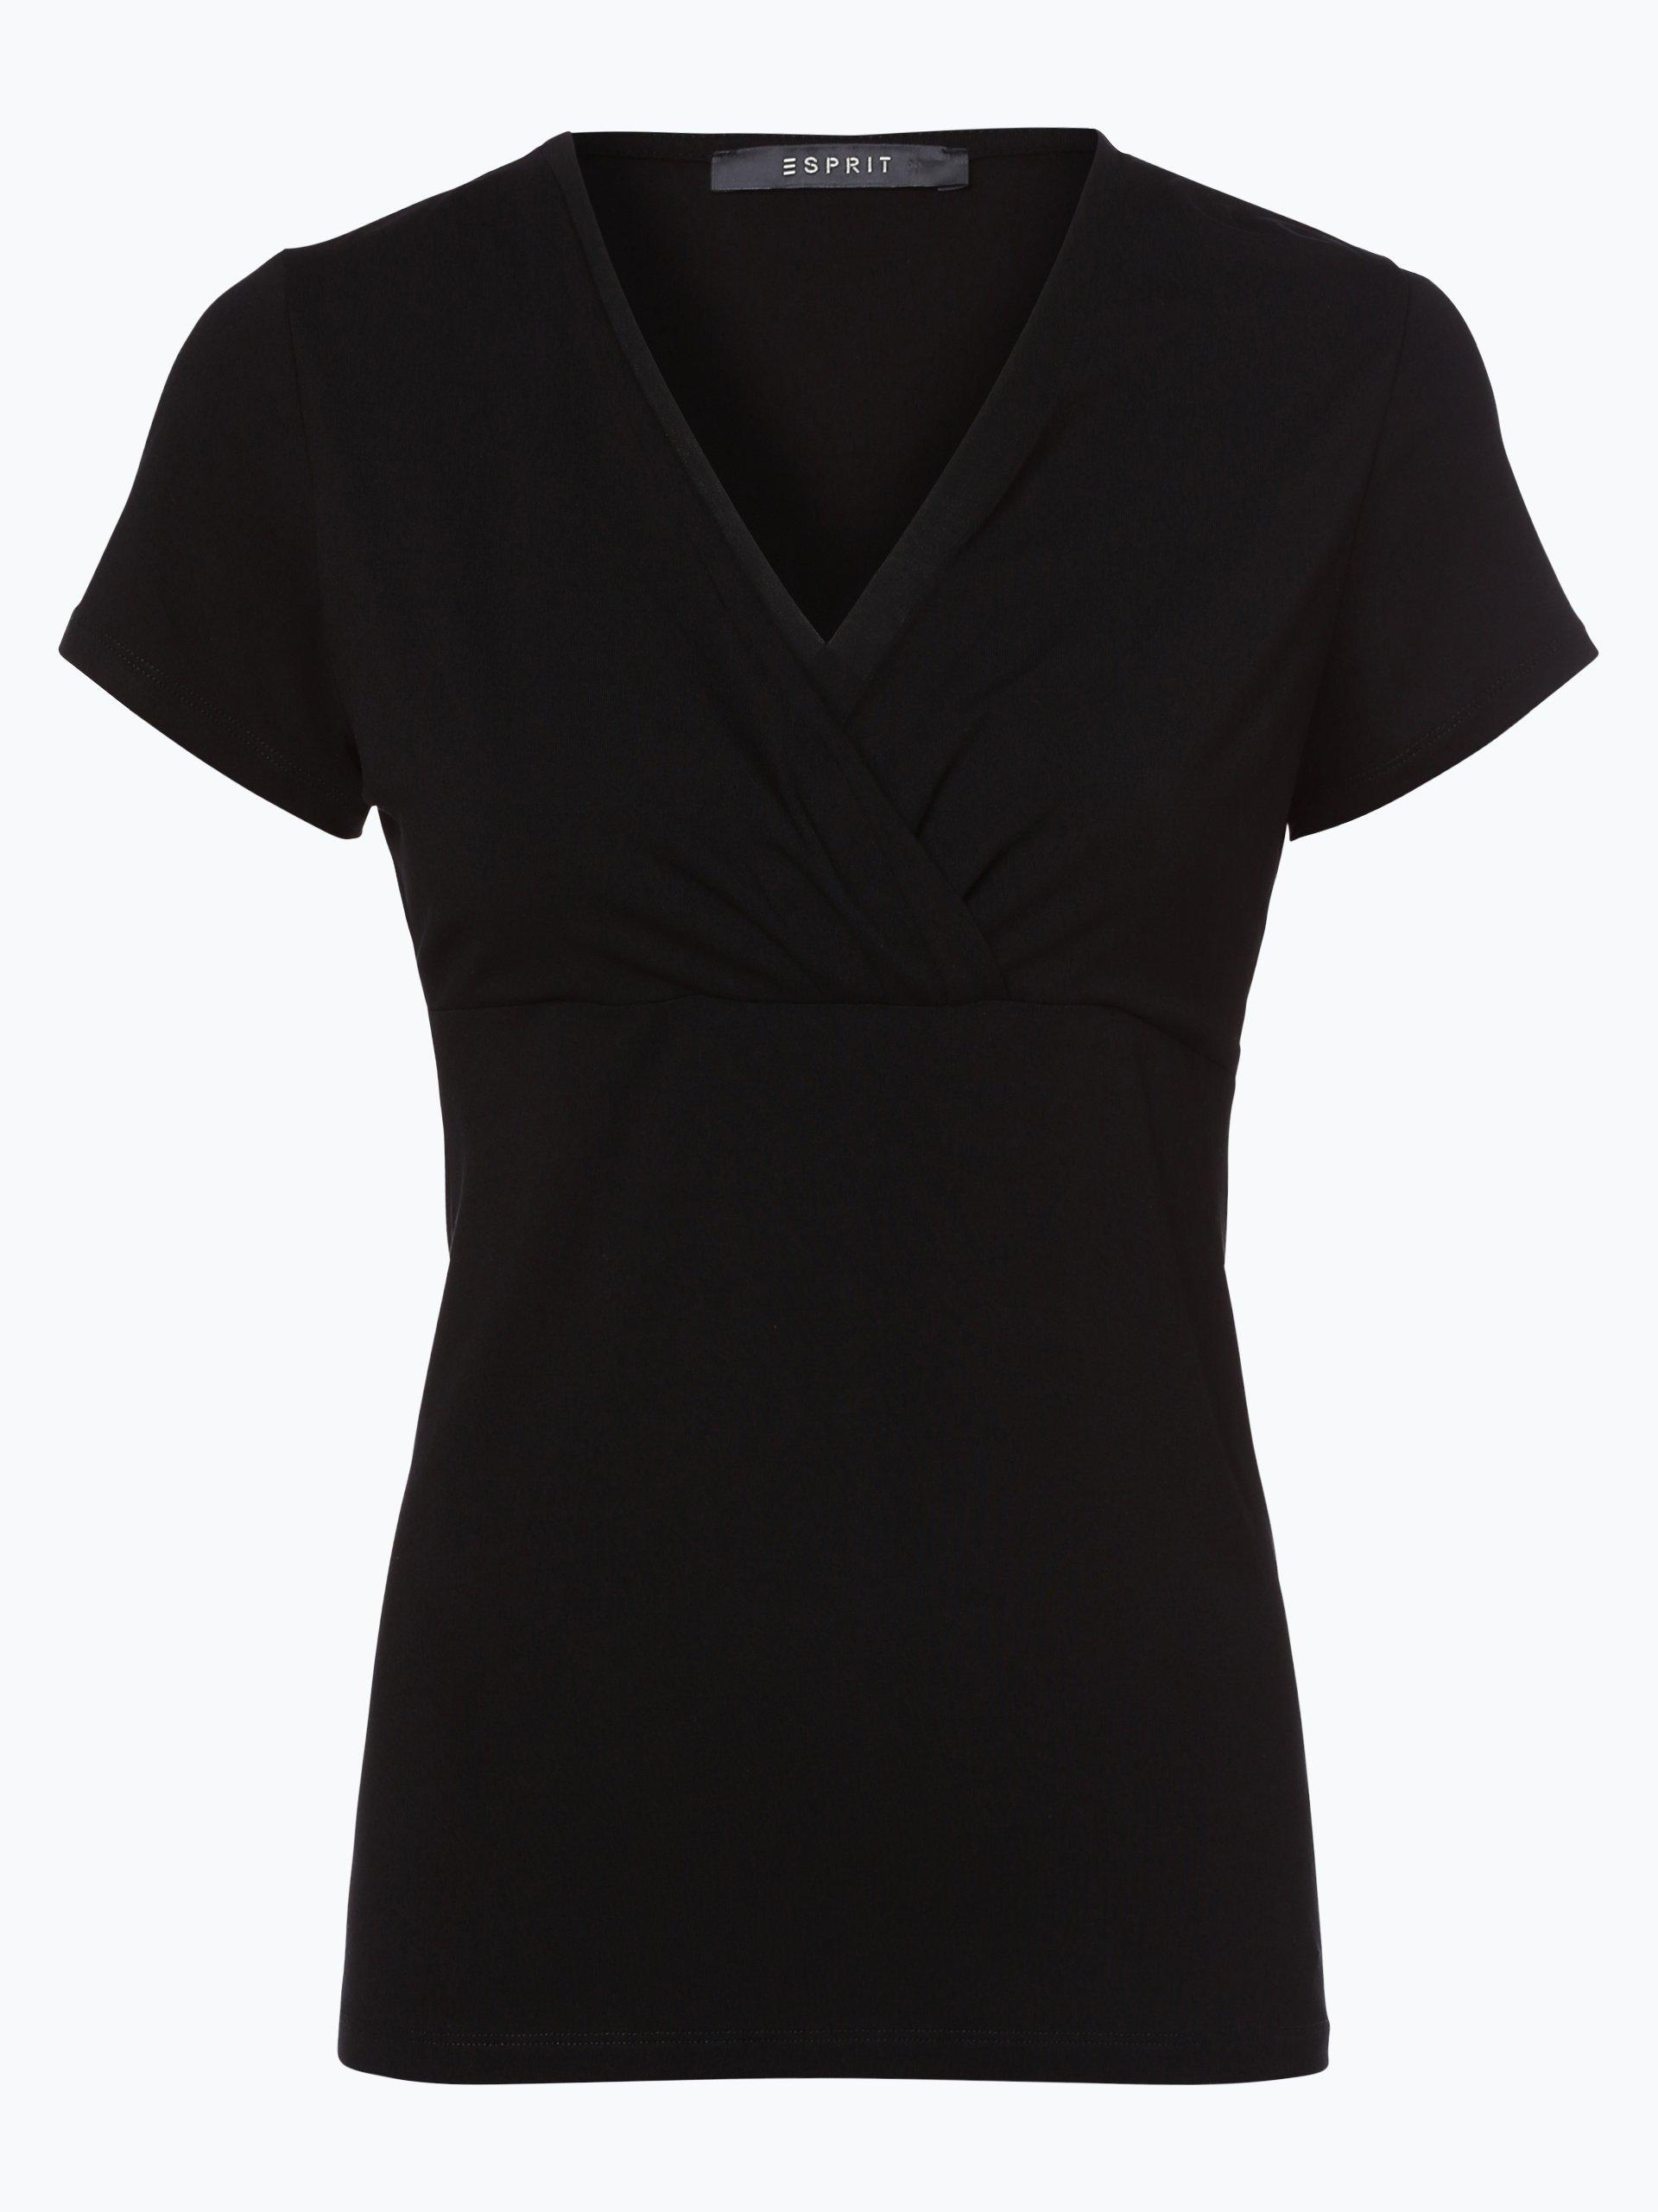 esprit collection damen t shirt schwarz uni online kaufen vangraaf com. Black Bedroom Furniture Sets. Home Design Ideas